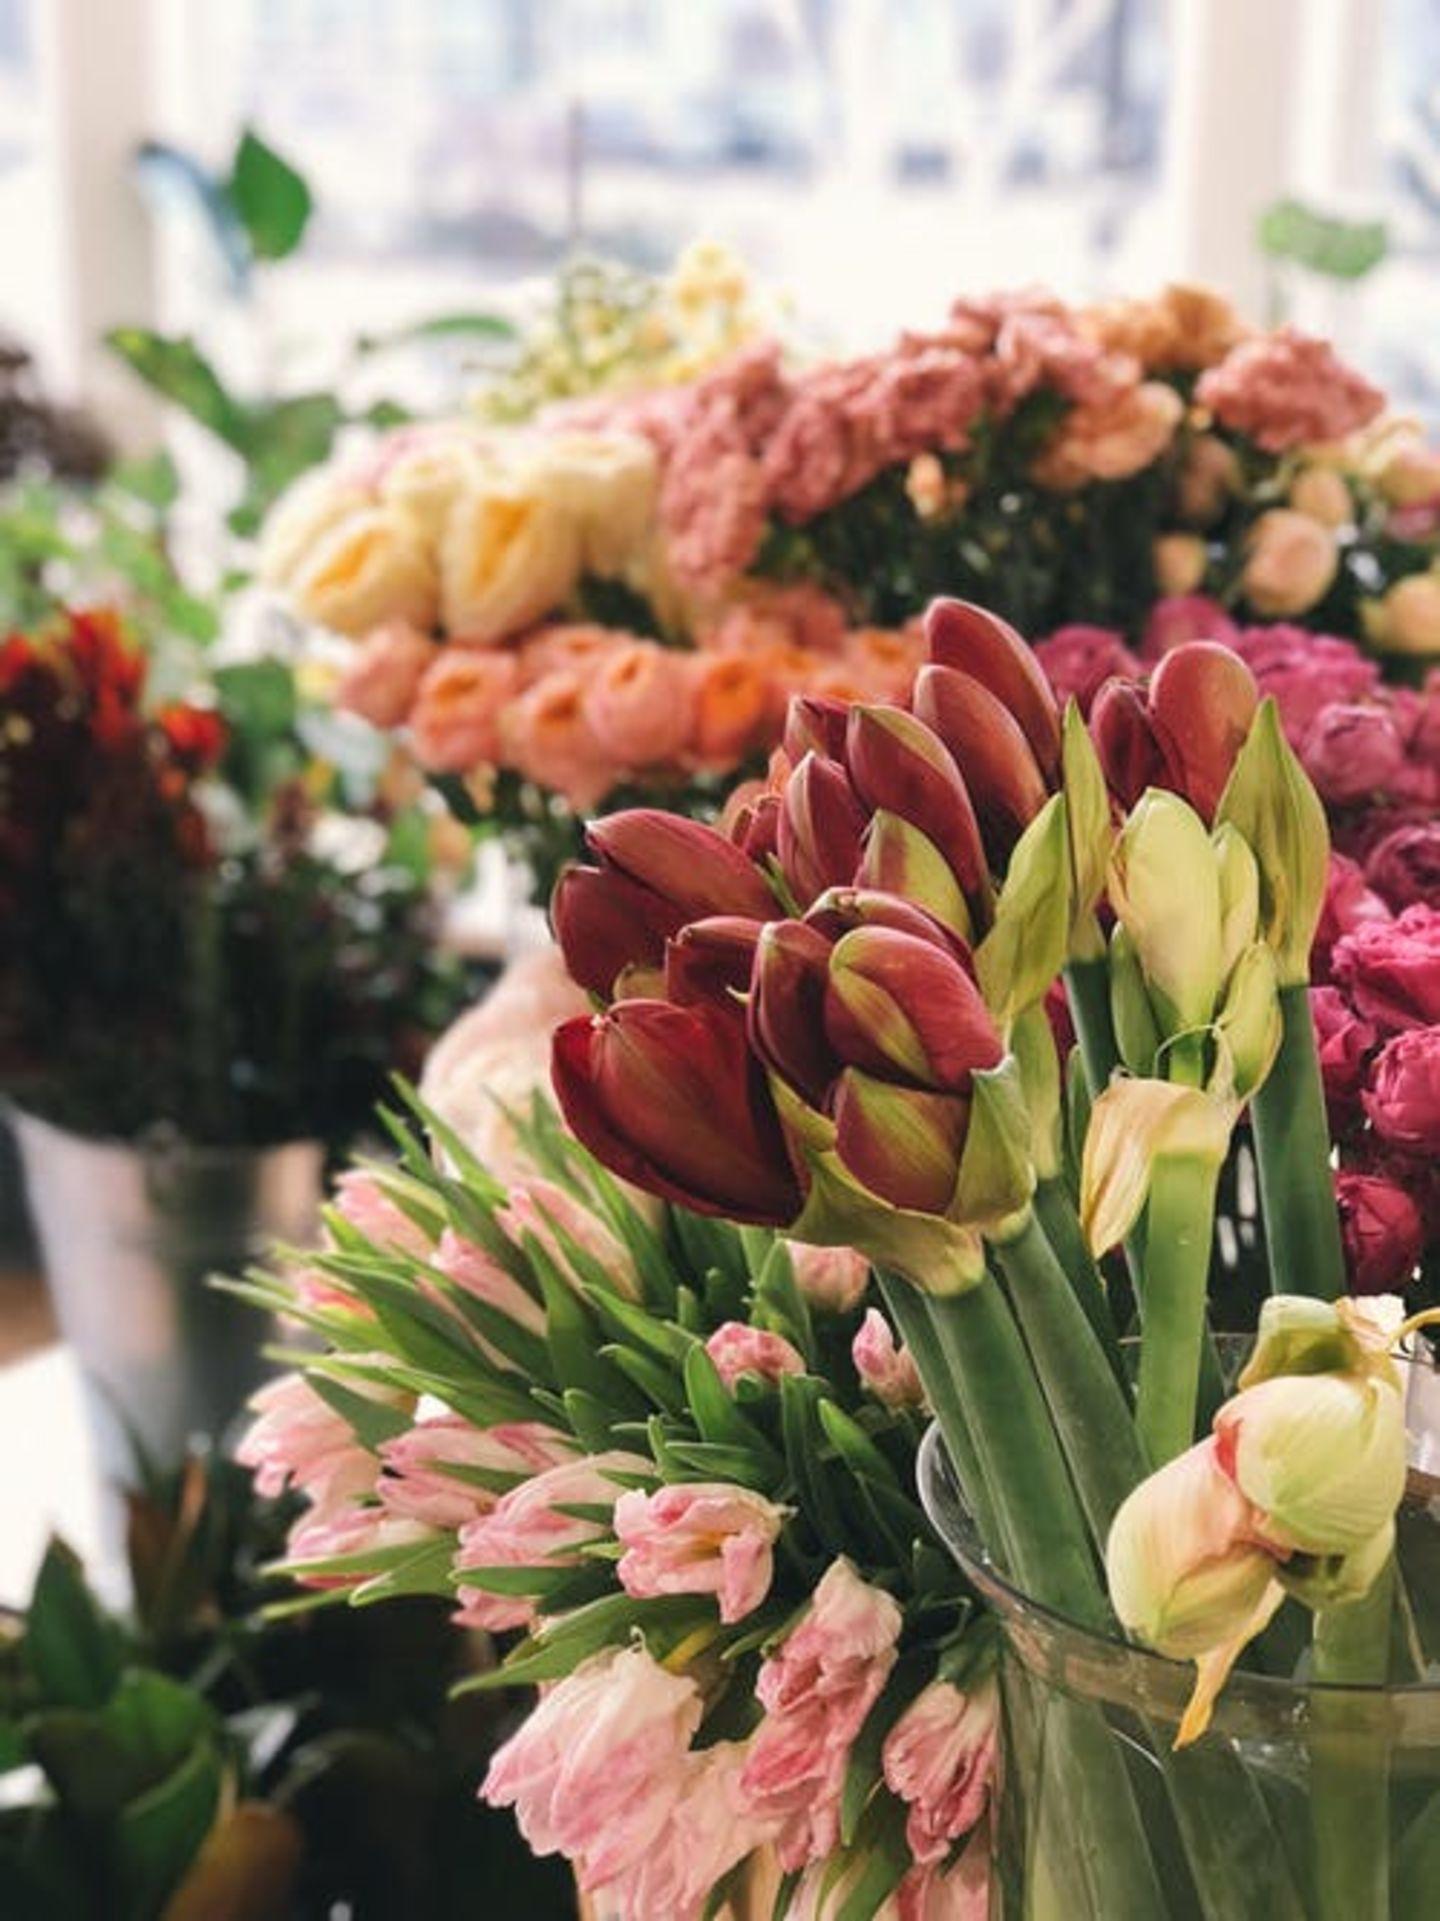 HiDubai-business-flower-land-landscape-gardening-works-maintenance-home-gardening-landscaping-international-city-warsan-1-dubai